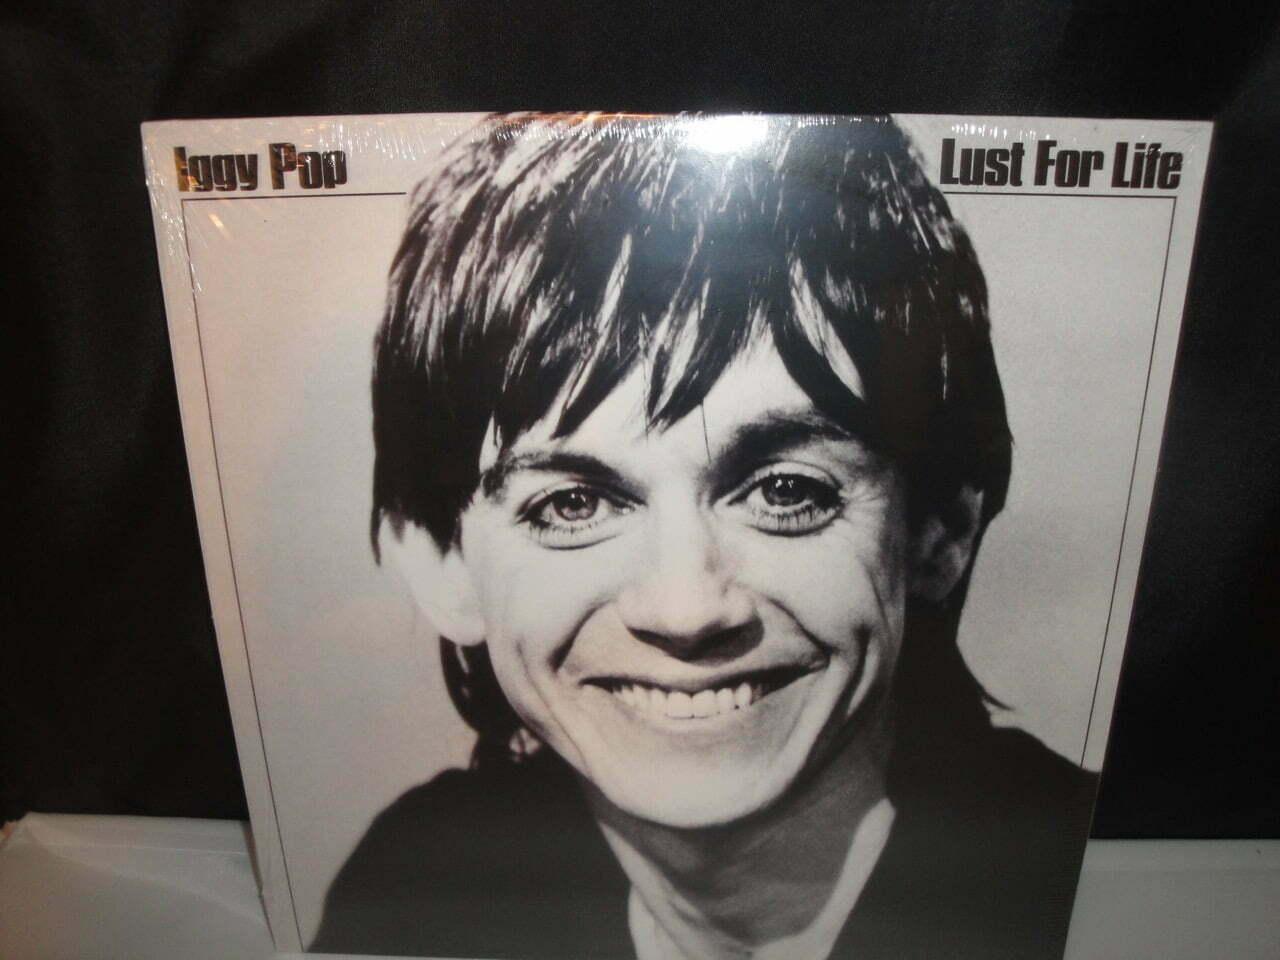 Iggy Pop - Lust For Life - Limited Edition 120 Gram Vinyl LP Reissue